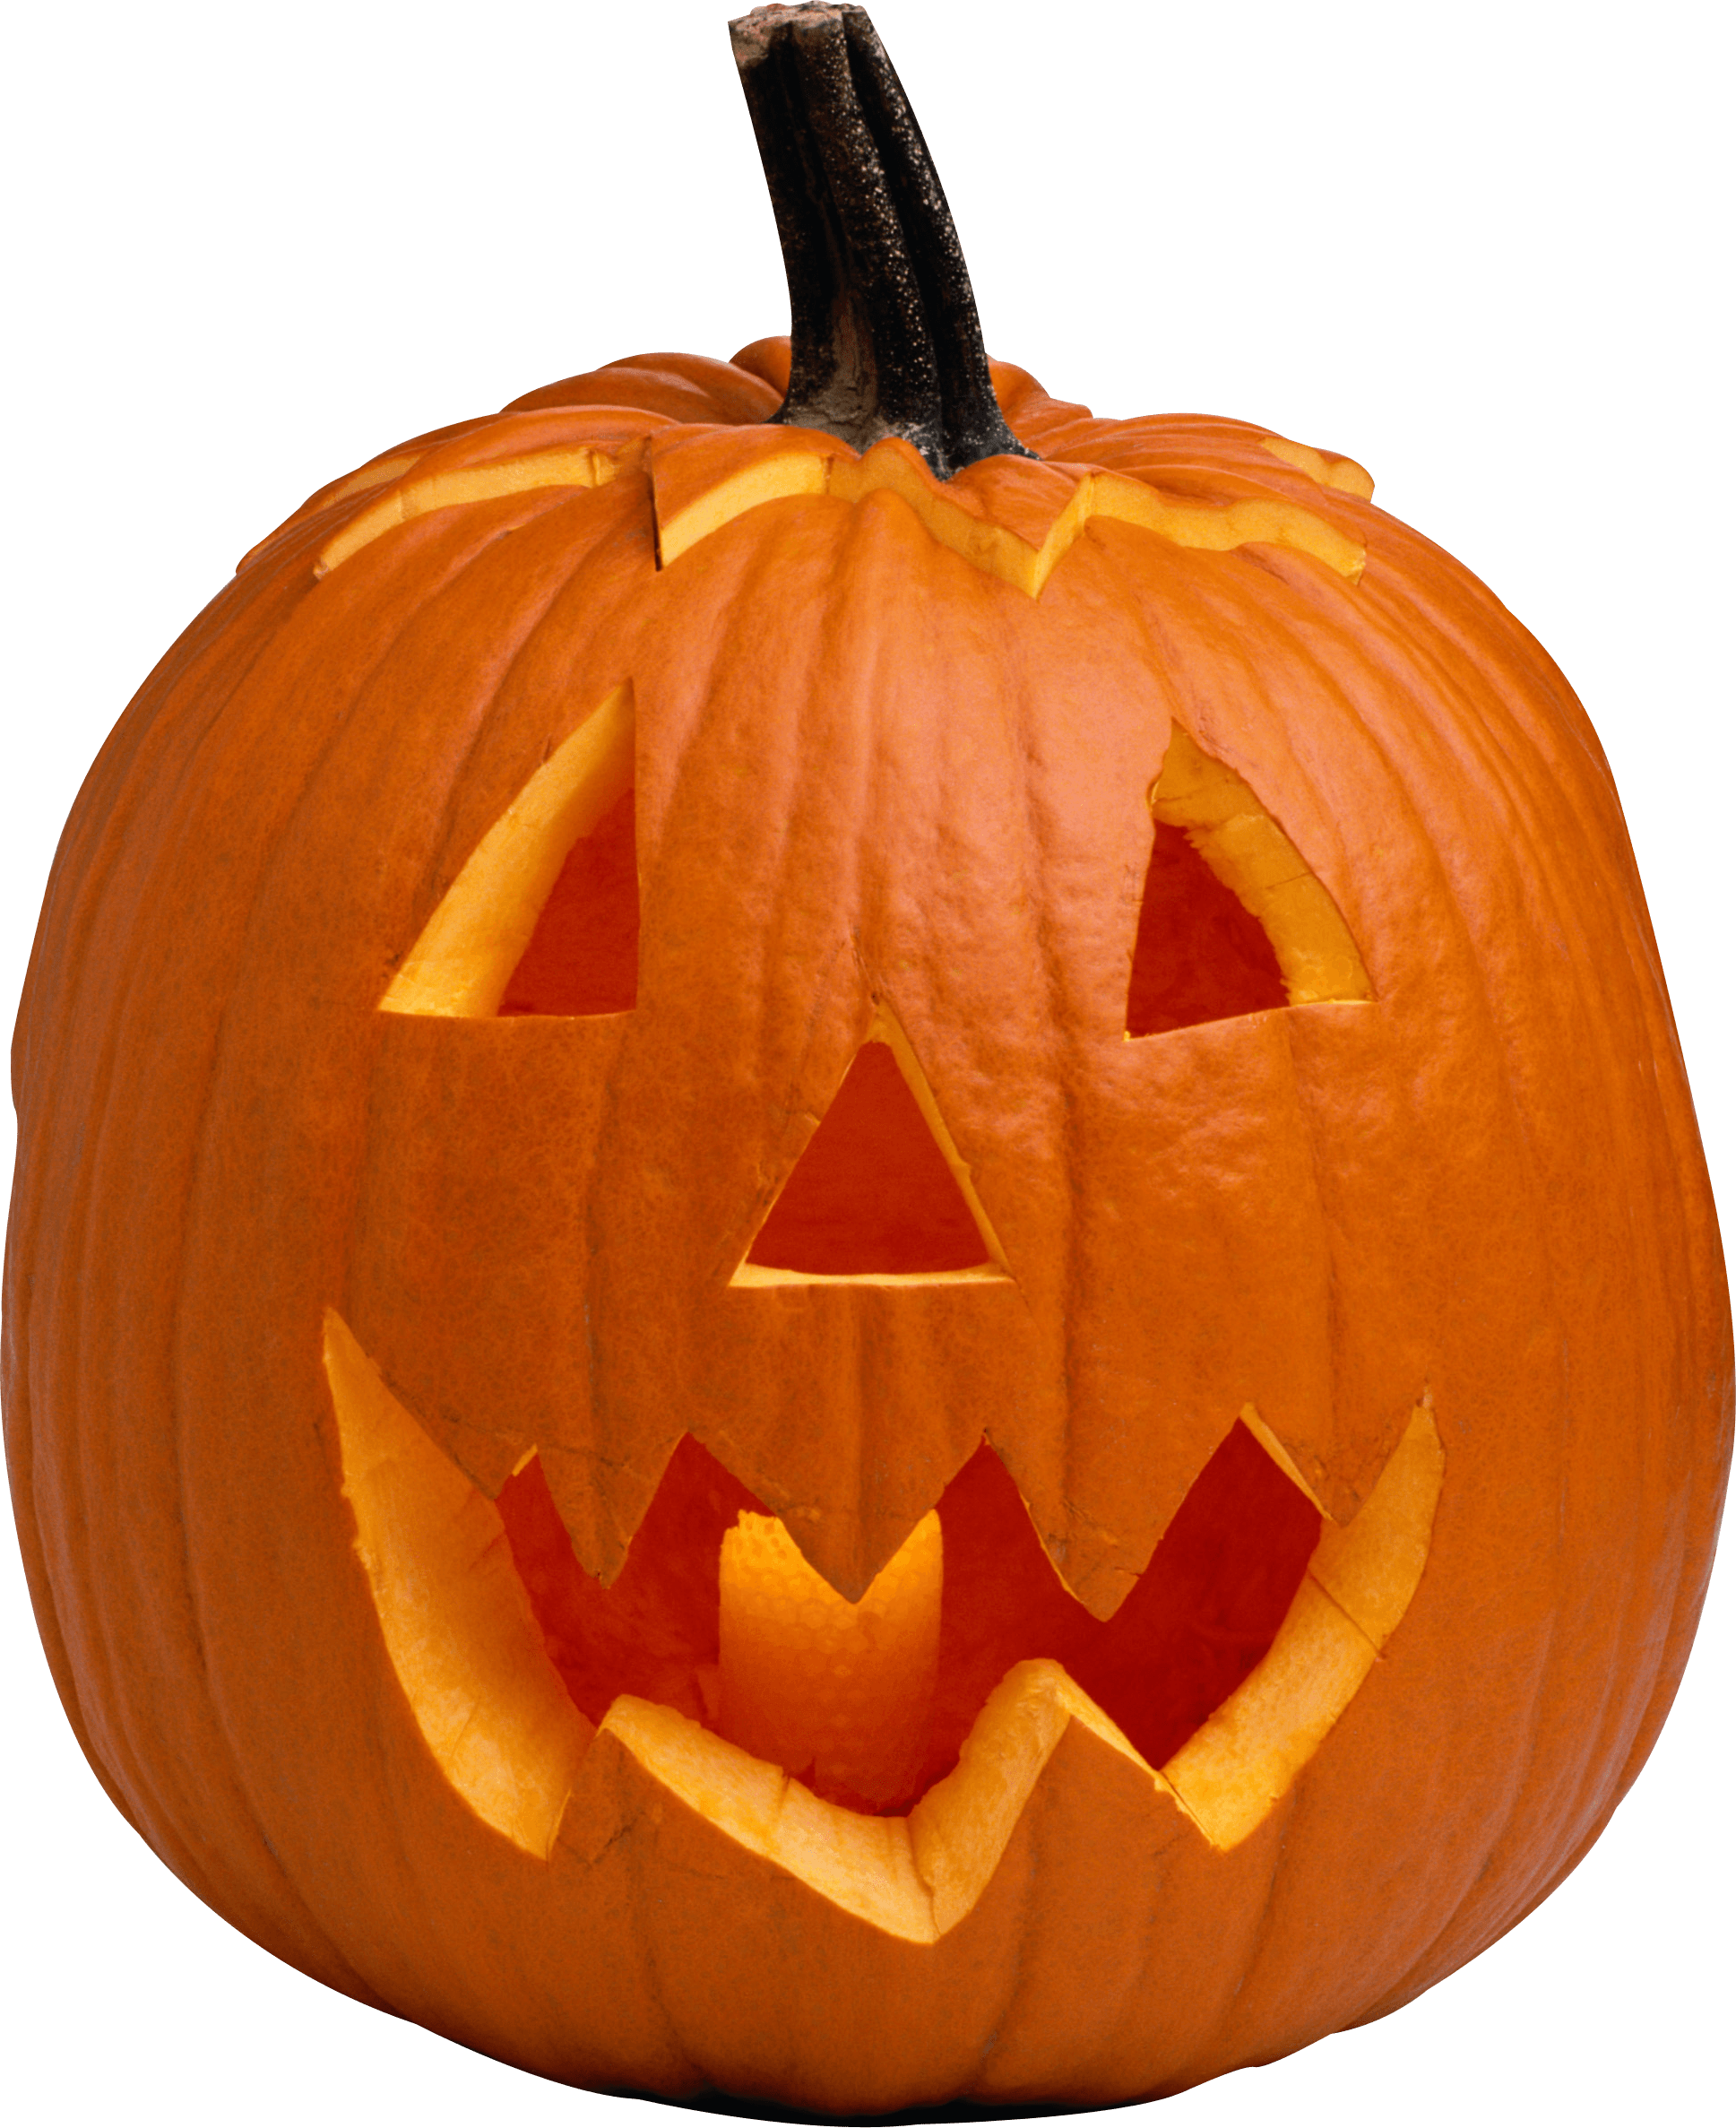 Creepy bats png stickpng. Frankenstein clipart halloween transparent background